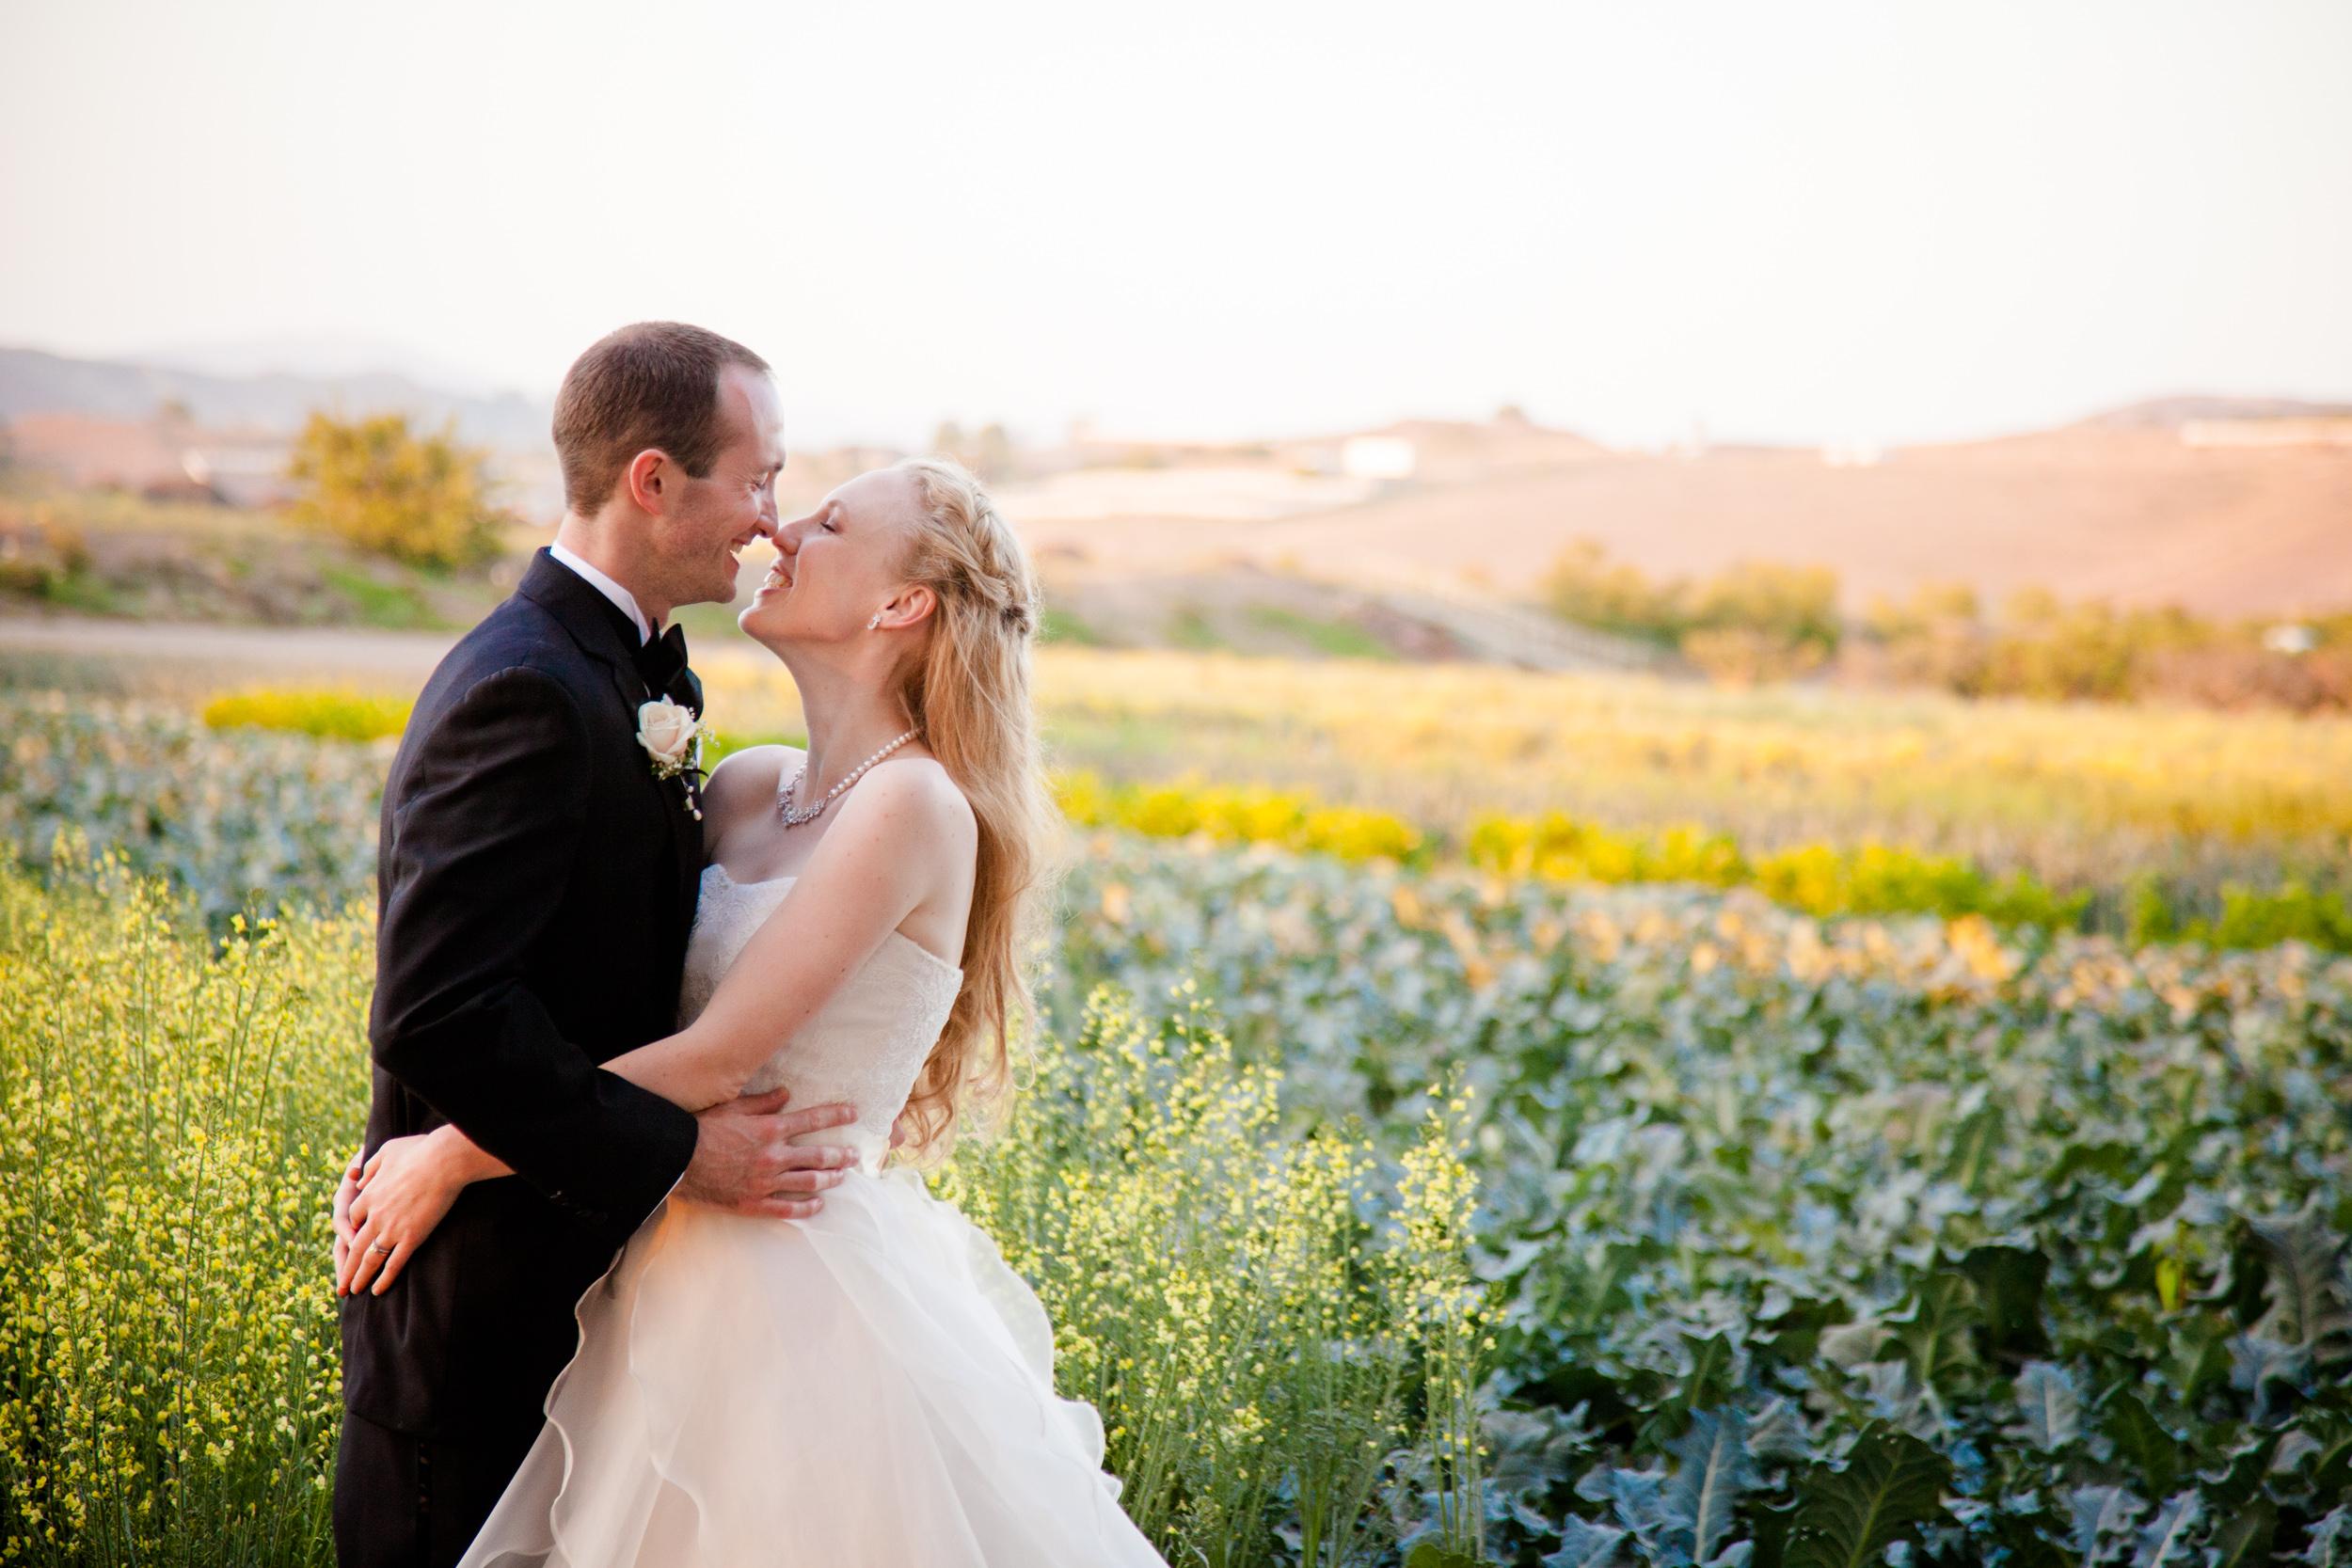 37--jewel-maree-photography-wedding.jpg